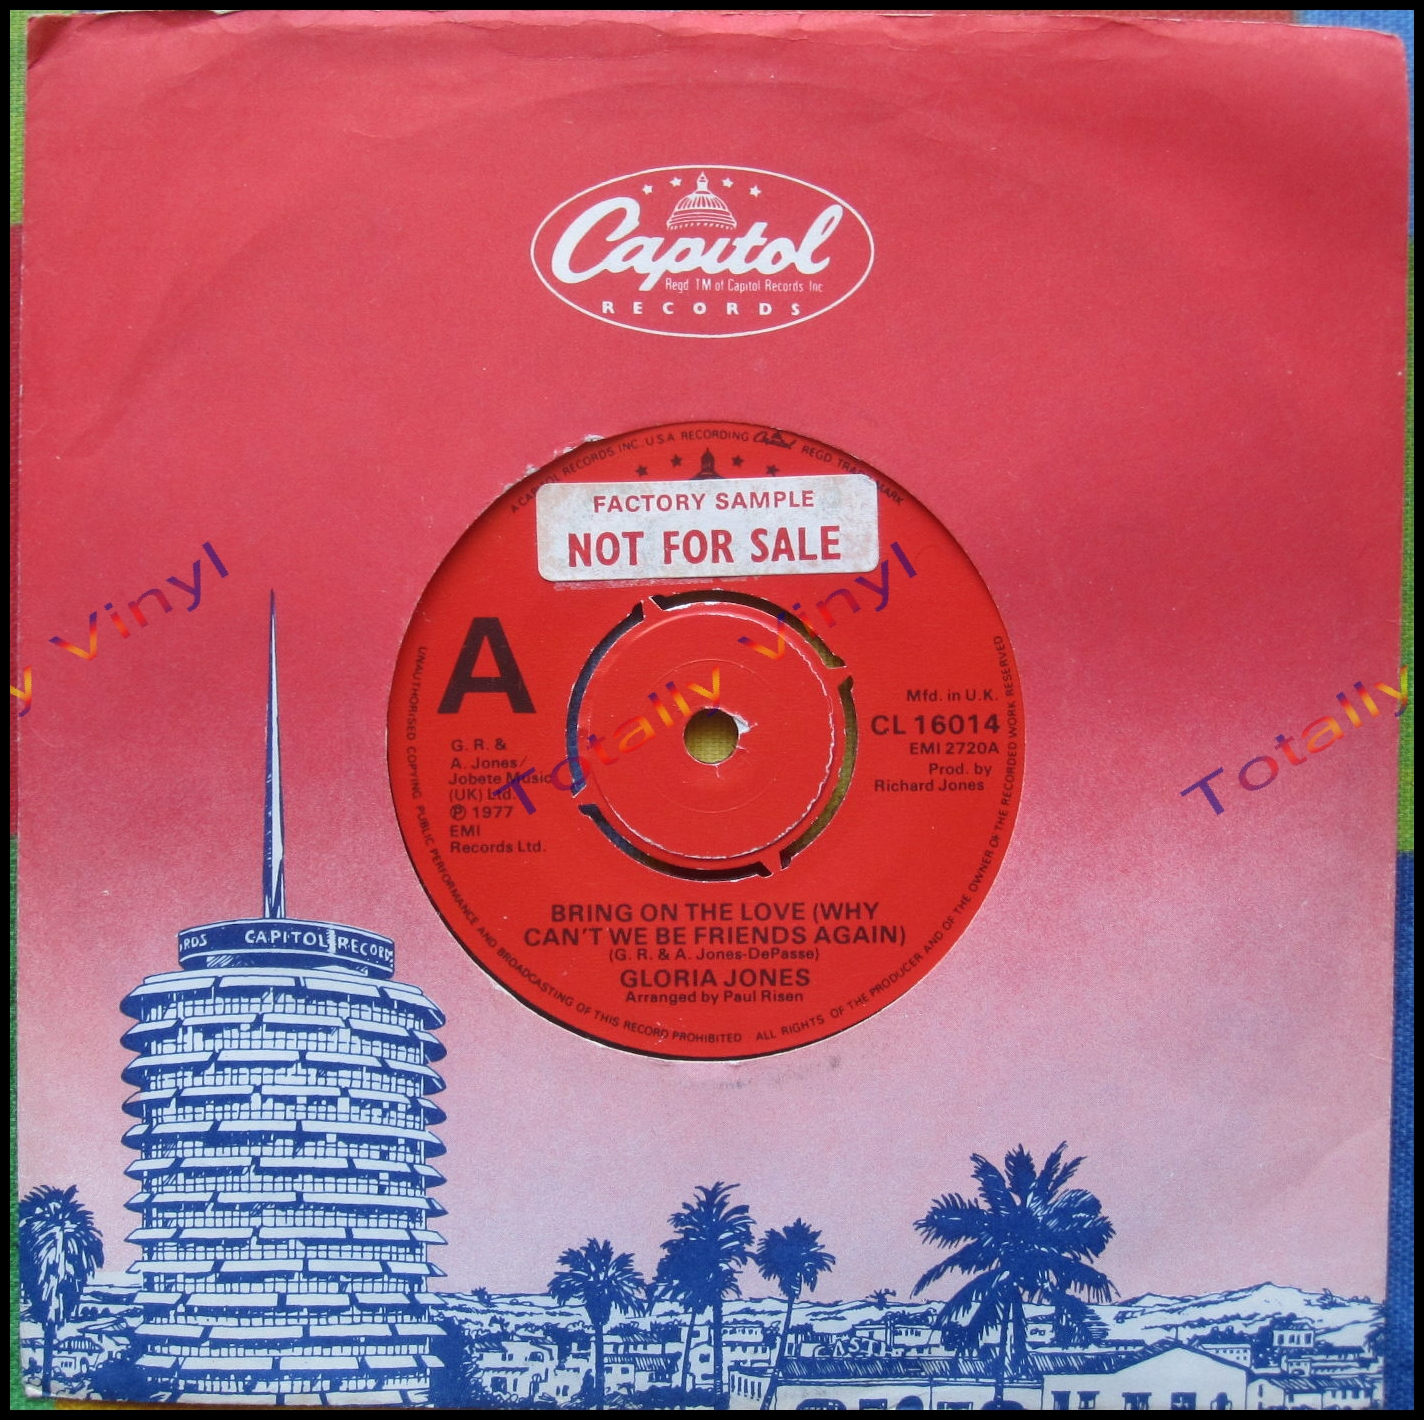 Totally Vinyl Records Jones Gloria Bring On The Love